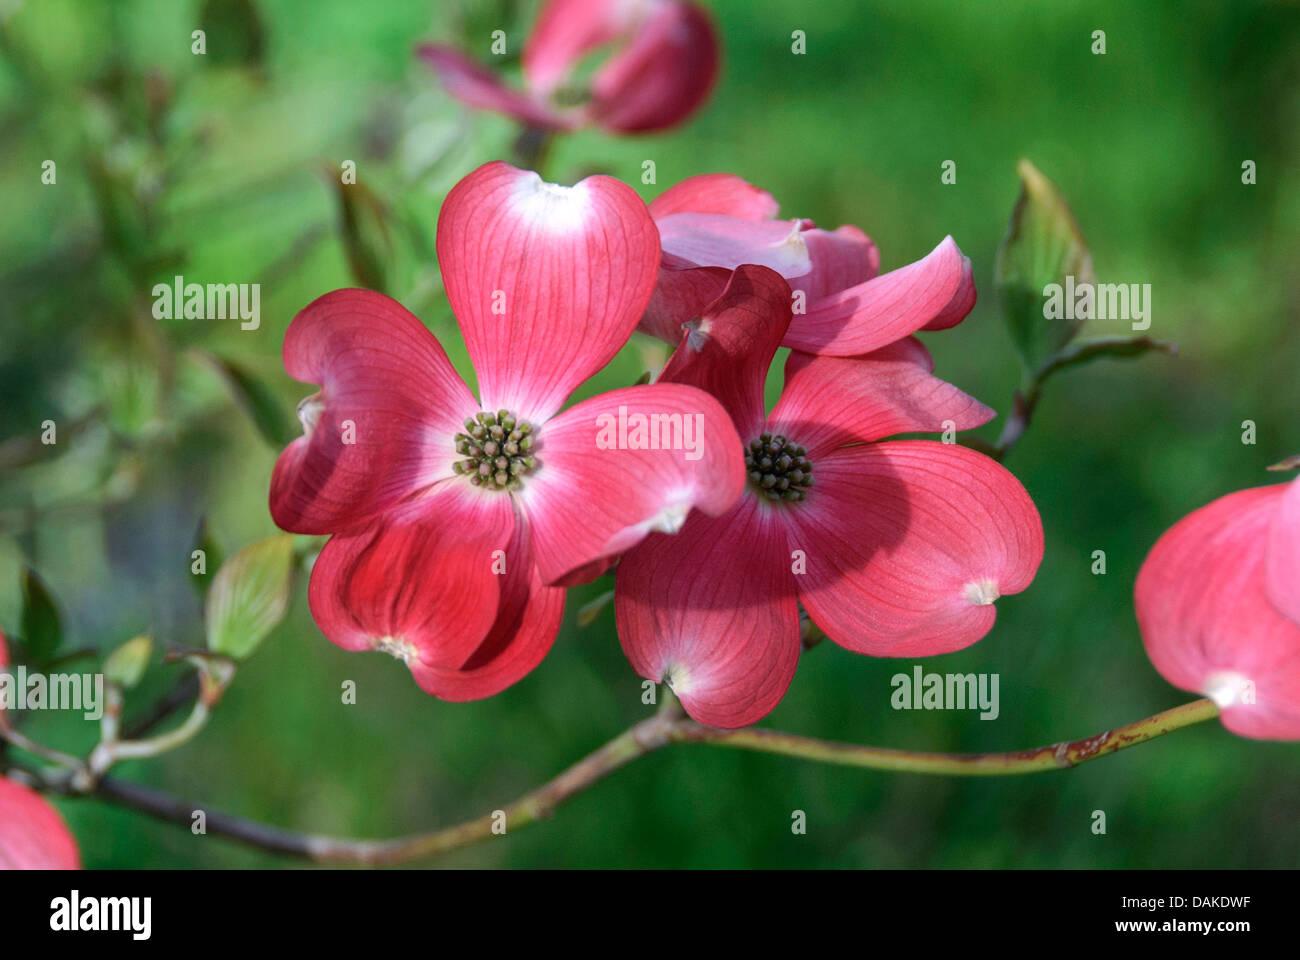 flowering dogwood american boxwood cornus florida 39 rubra. Black Bedroom Furniture Sets. Home Design Ideas